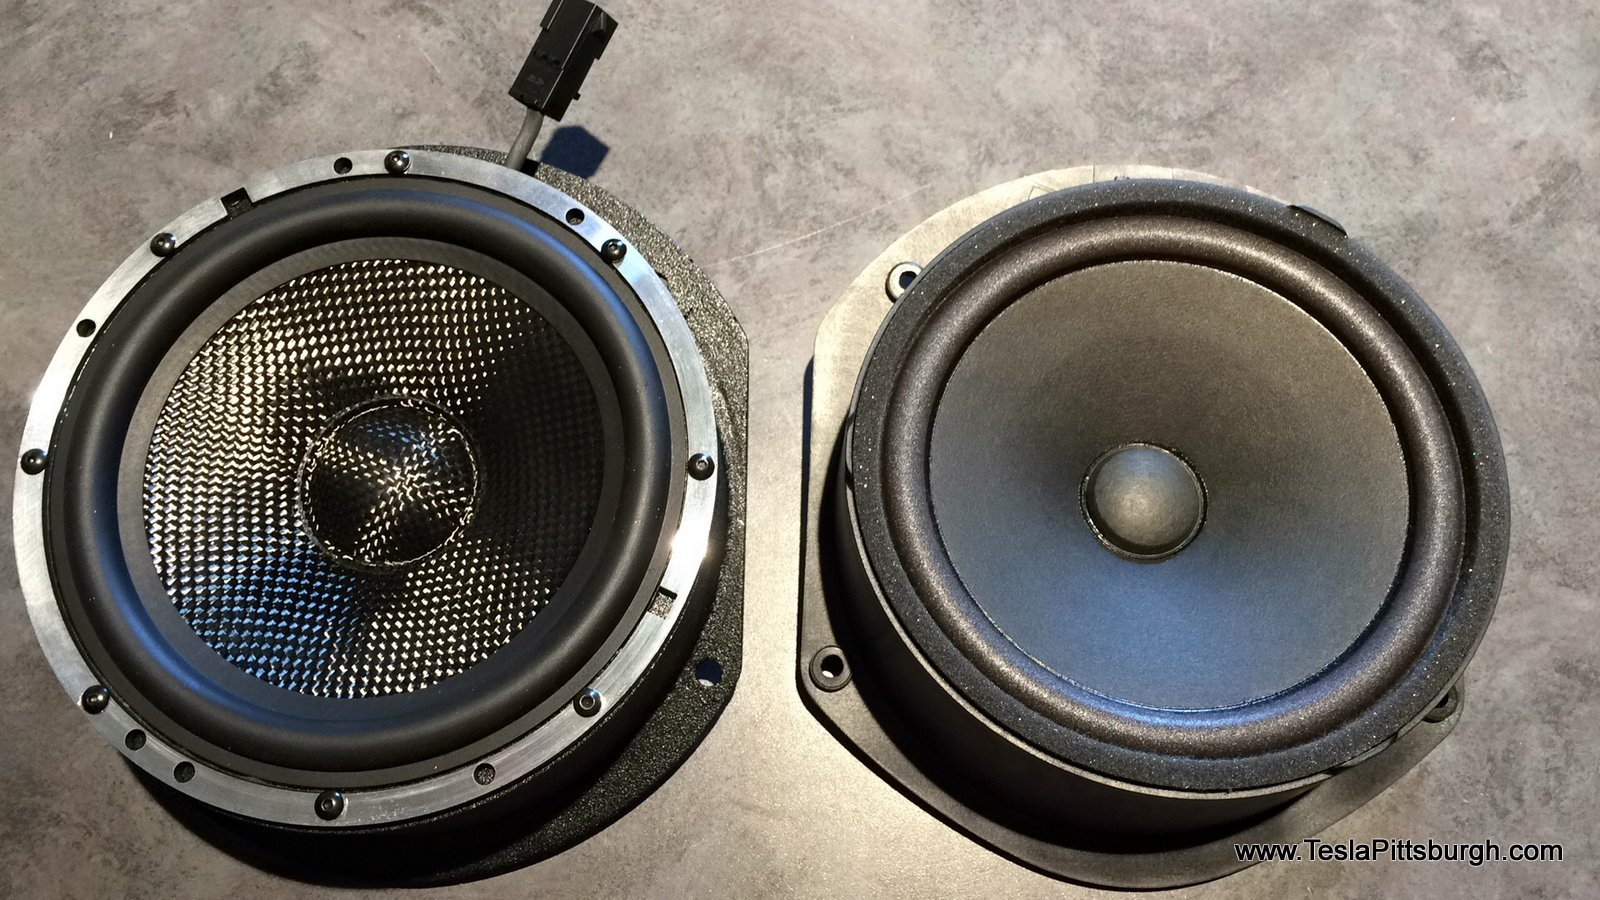 reversed pic of side by side light harmonic labs factory speaker tesla pittsburgh